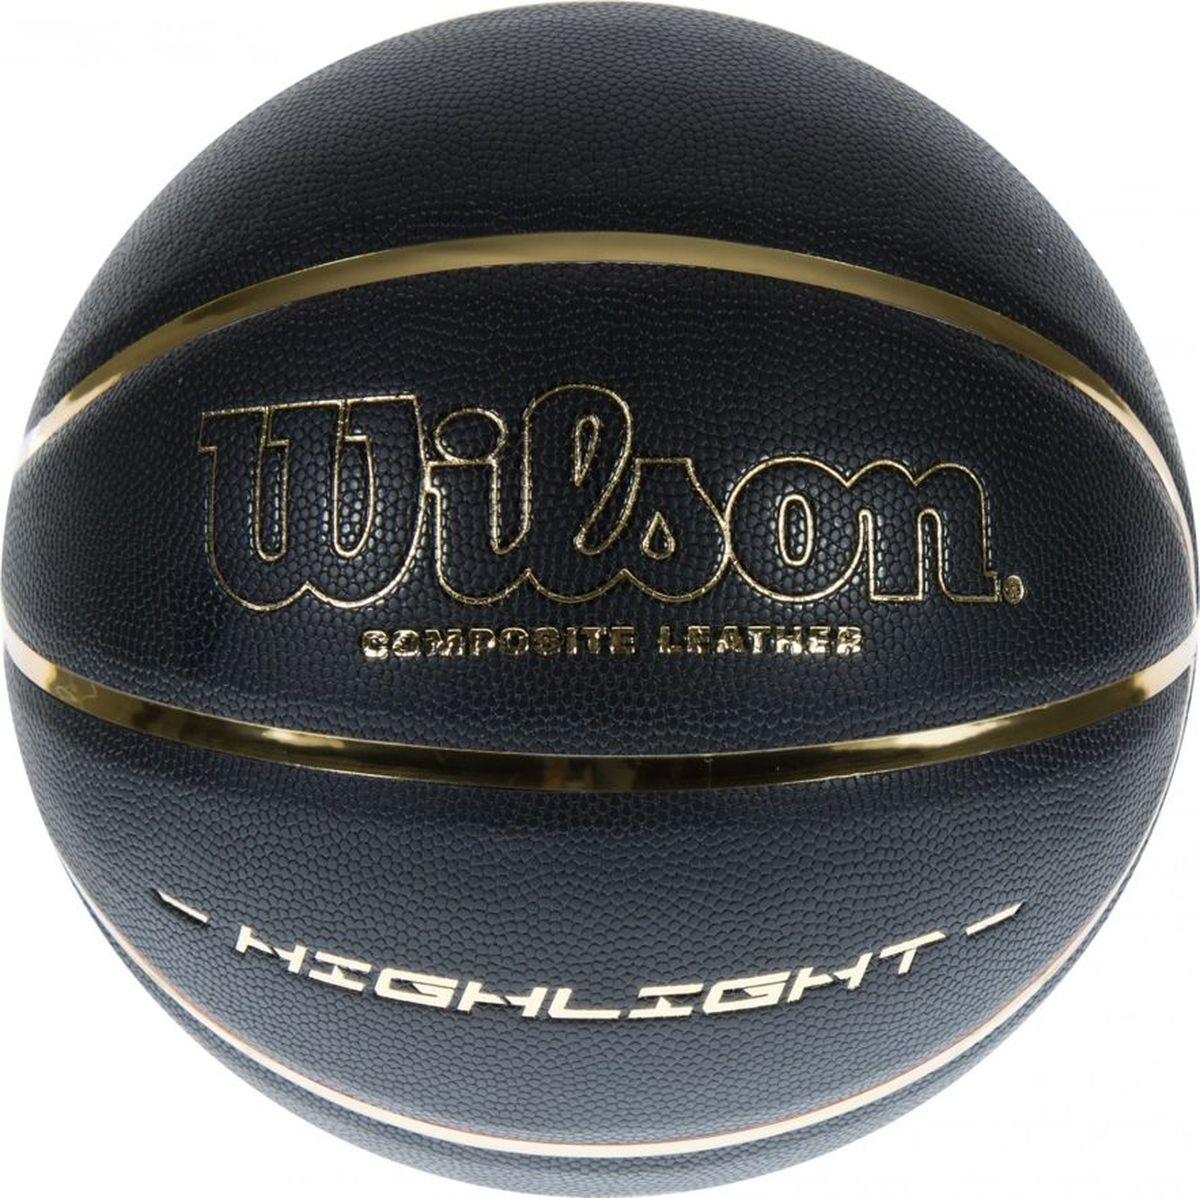 Мяч баскетбольный Wilson  Highlight , цвет: черный. Размер 7 - Баскетбол